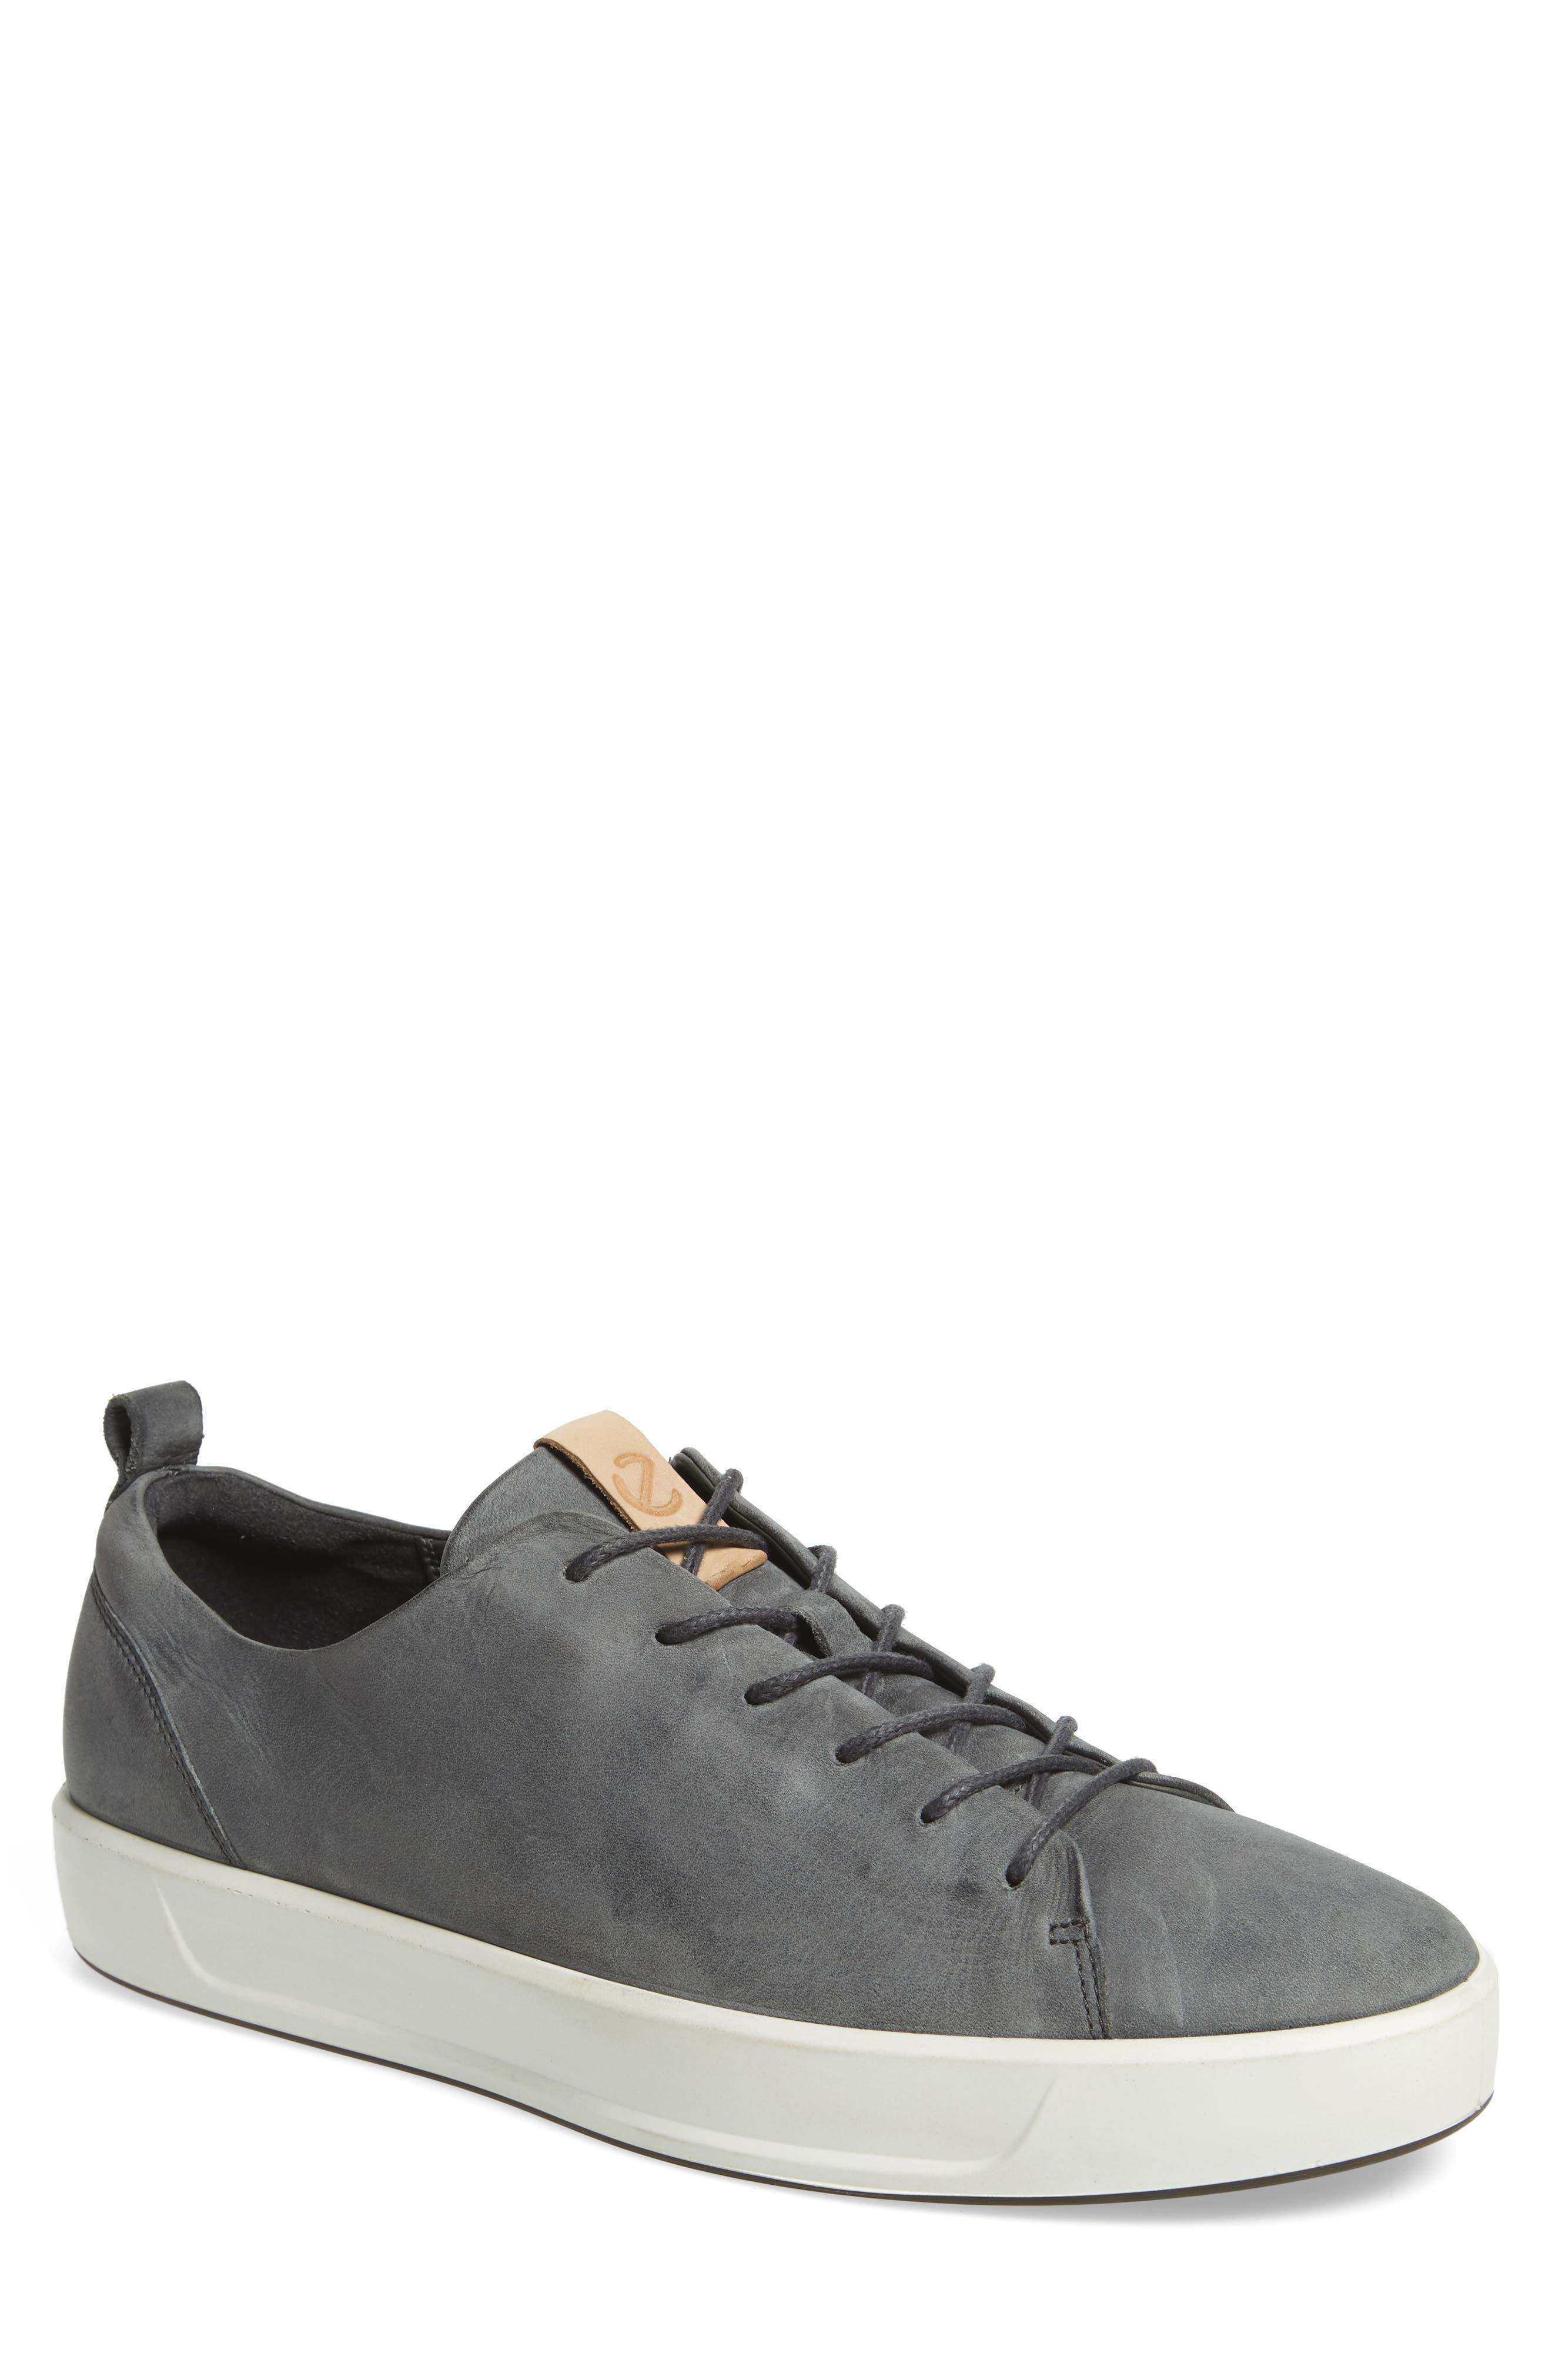 ECCO, Soft 8 Sneaker, Main thumbnail 1, color, 025